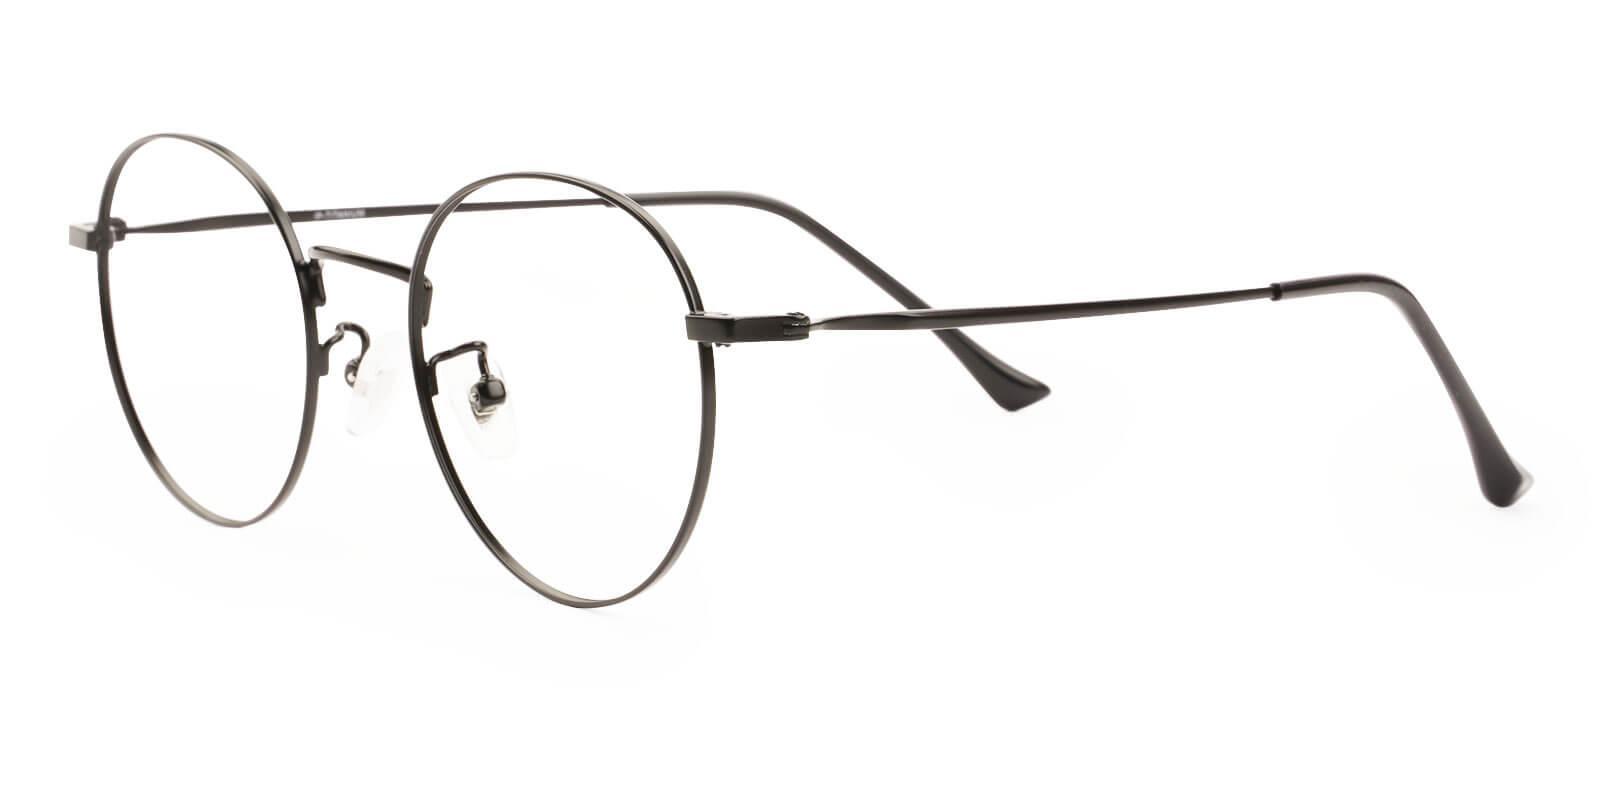 Peyton Black Titanium NosePads , Eyeglasses , Lightweight Frames from ABBE Glasses